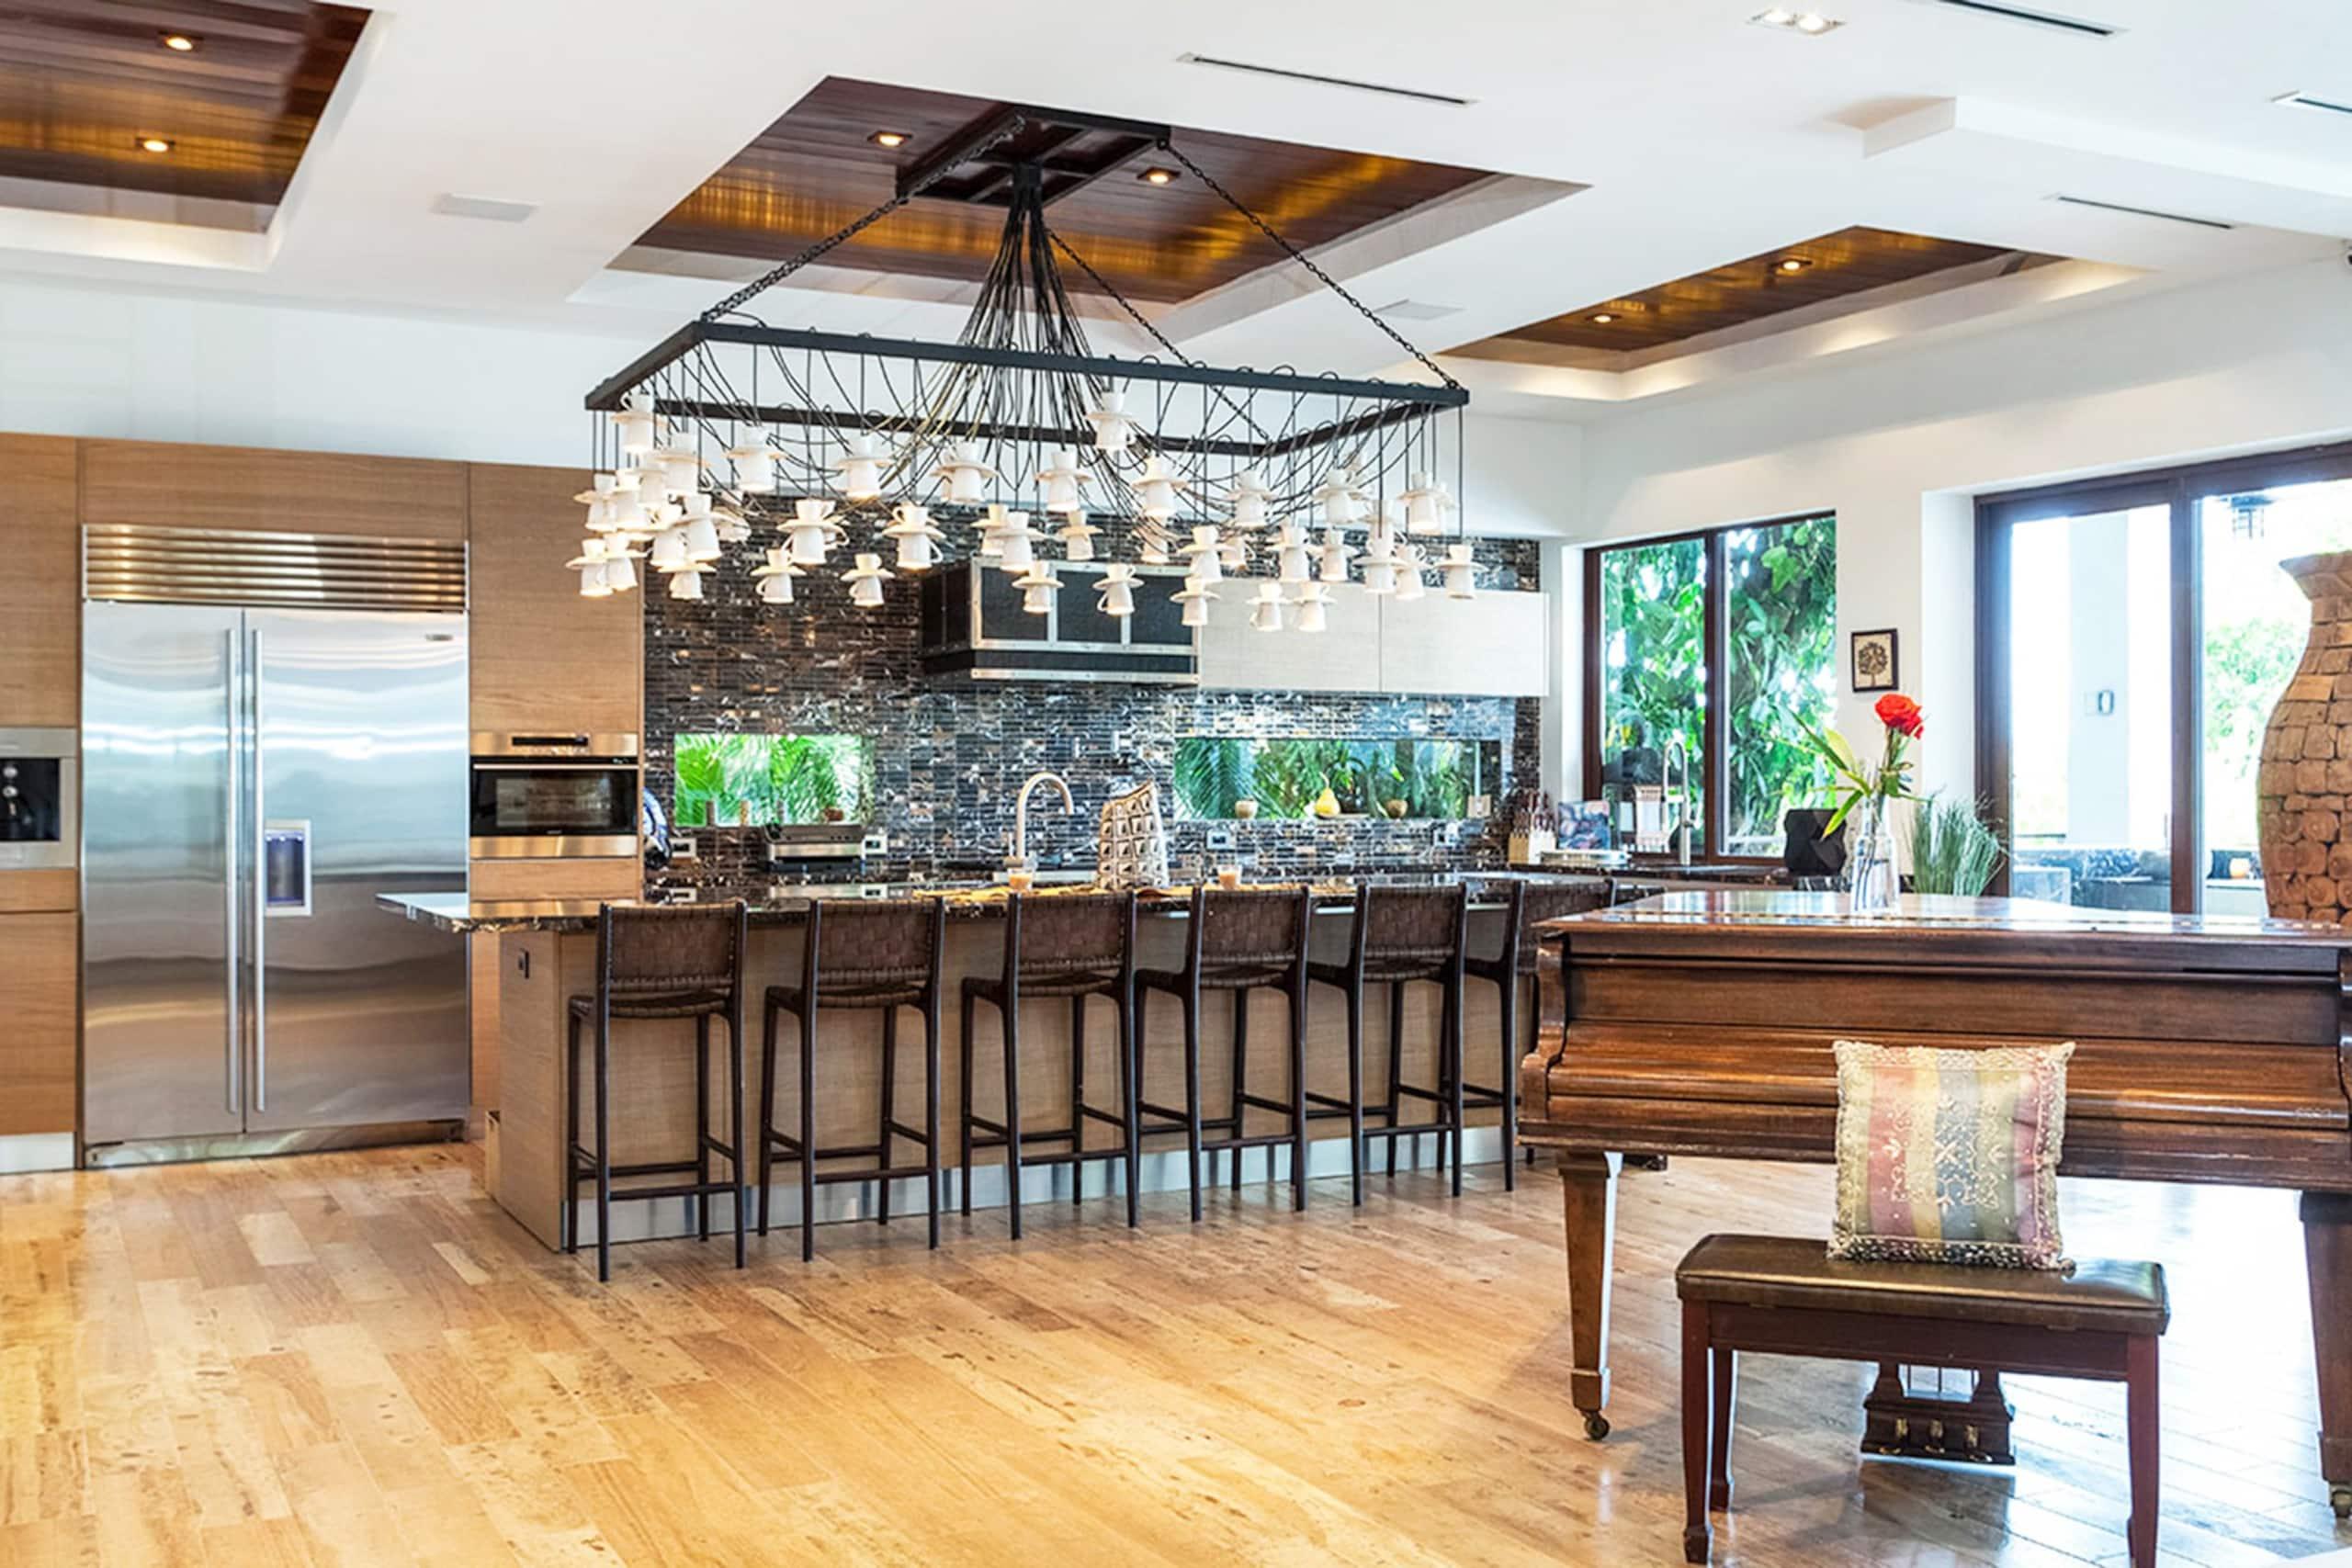 Apartment Villa Riza - Magnificent Balinese-style photo 20319886